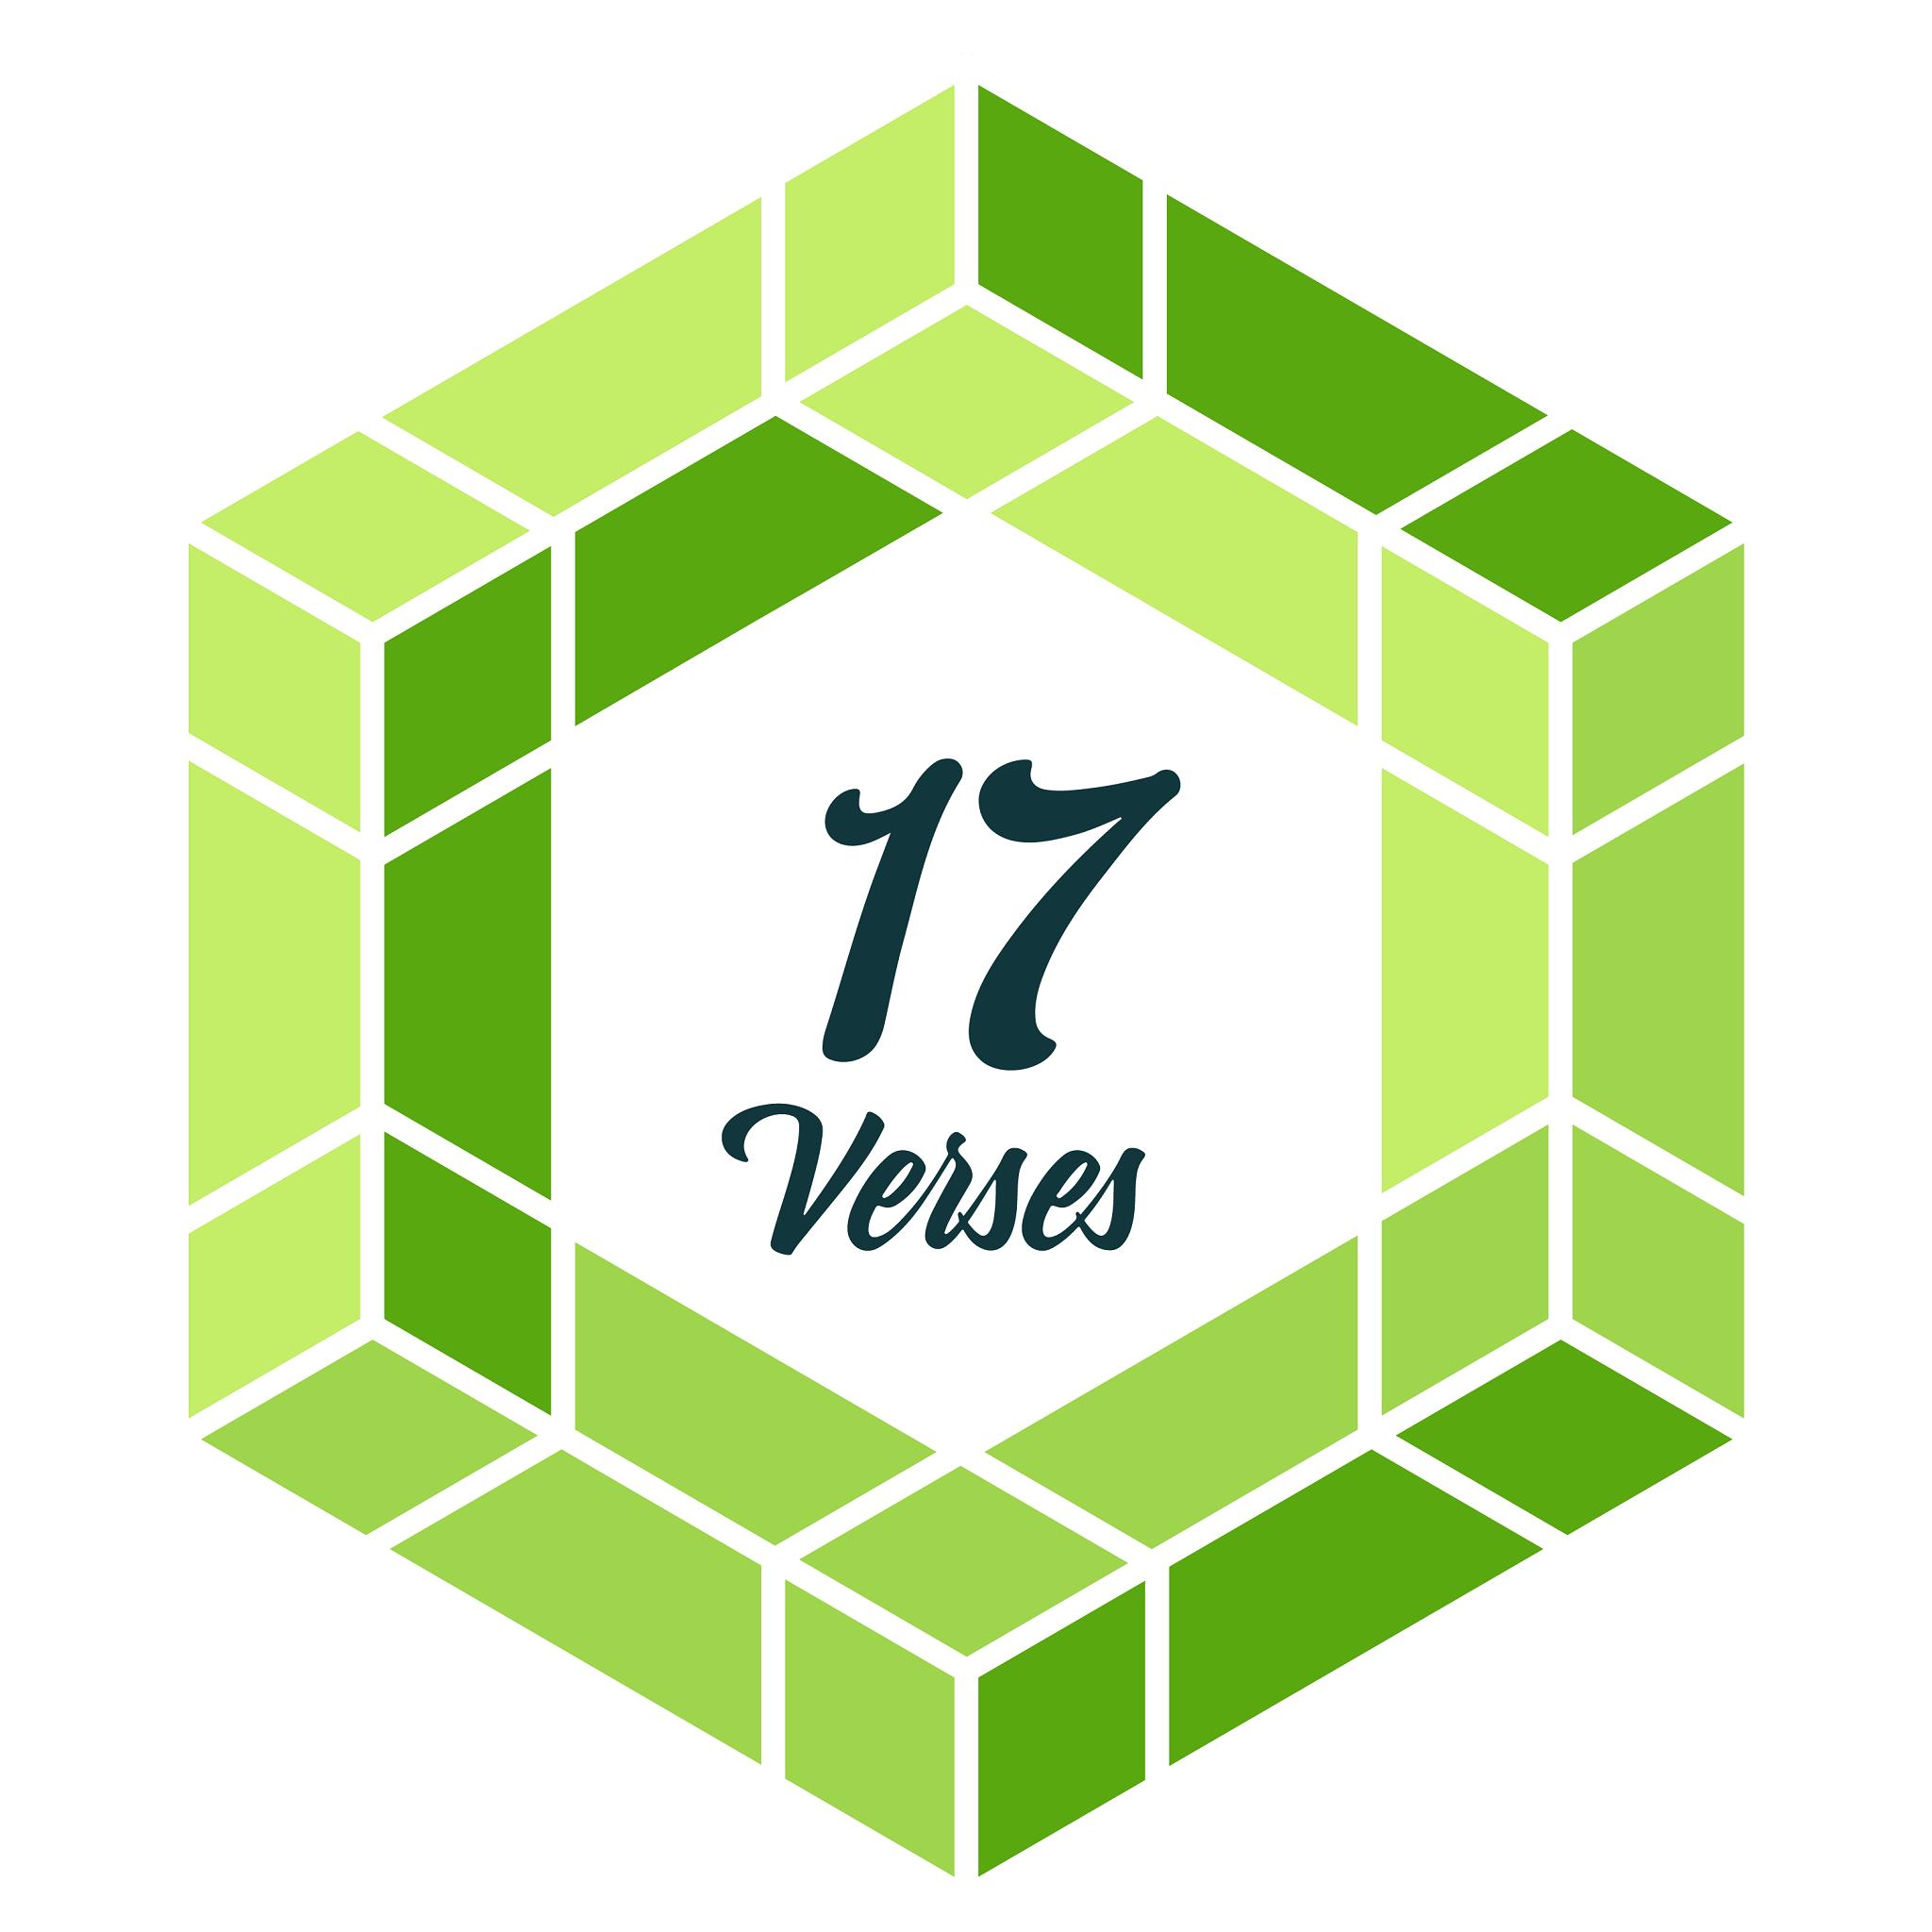 Year 2 - Surah 4 (An-Nisâ), Verses 43-59